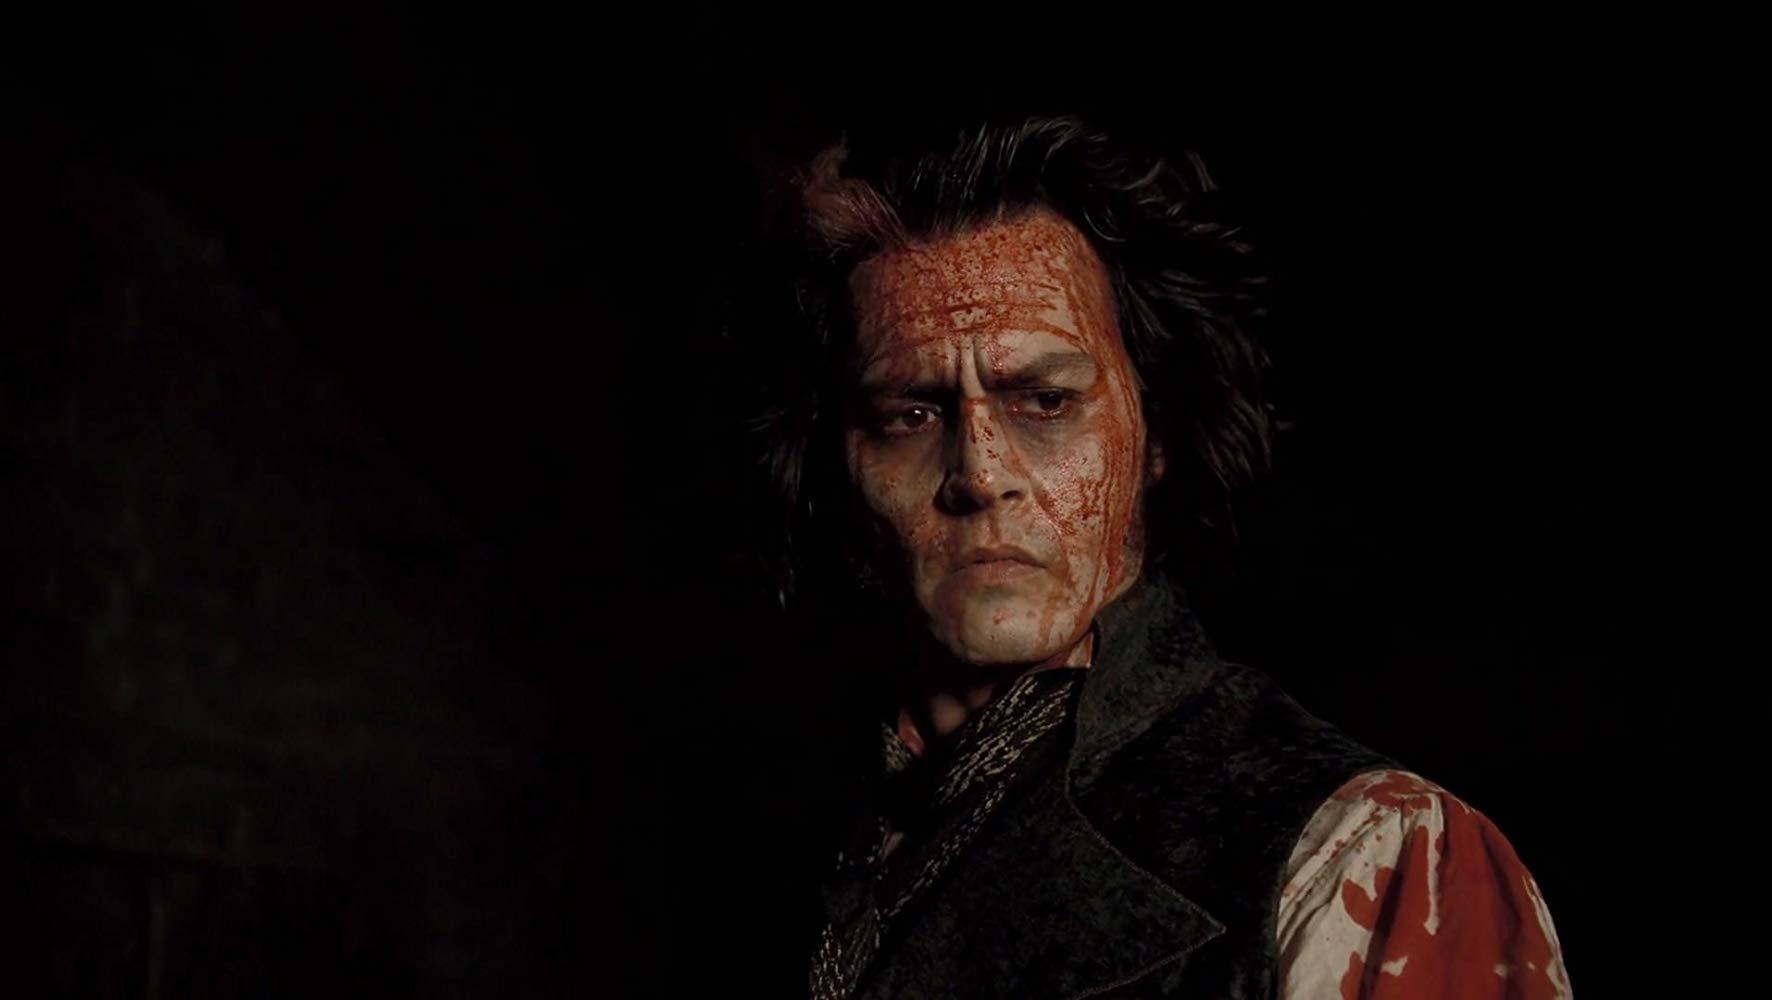 20 movies to watch on halloween 2.jpg